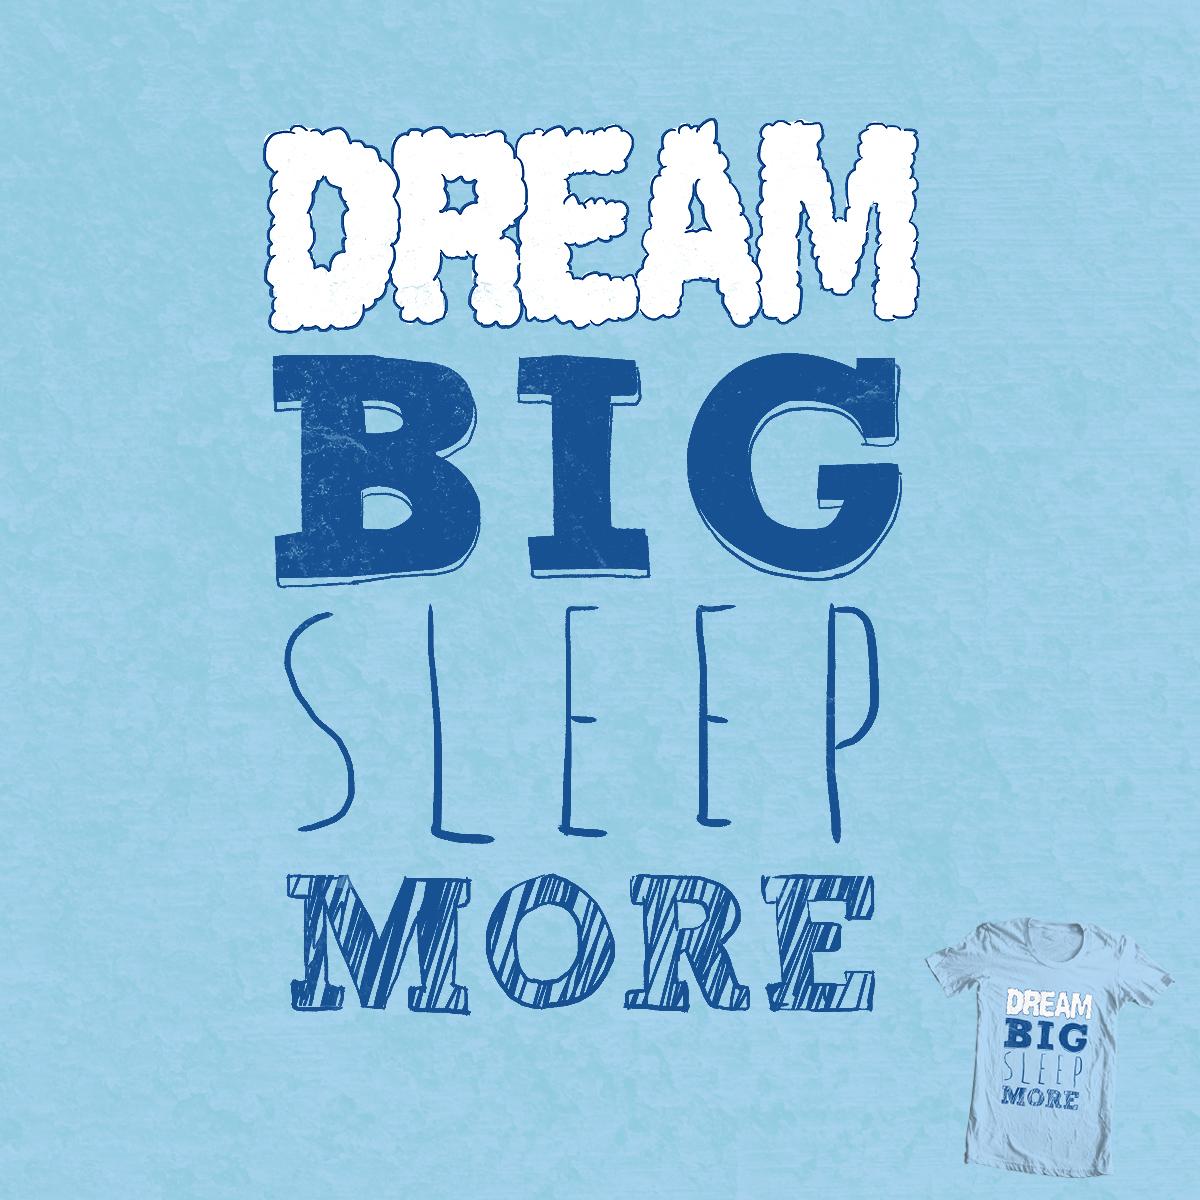 Dream Big by Evan_Luza on Threadless